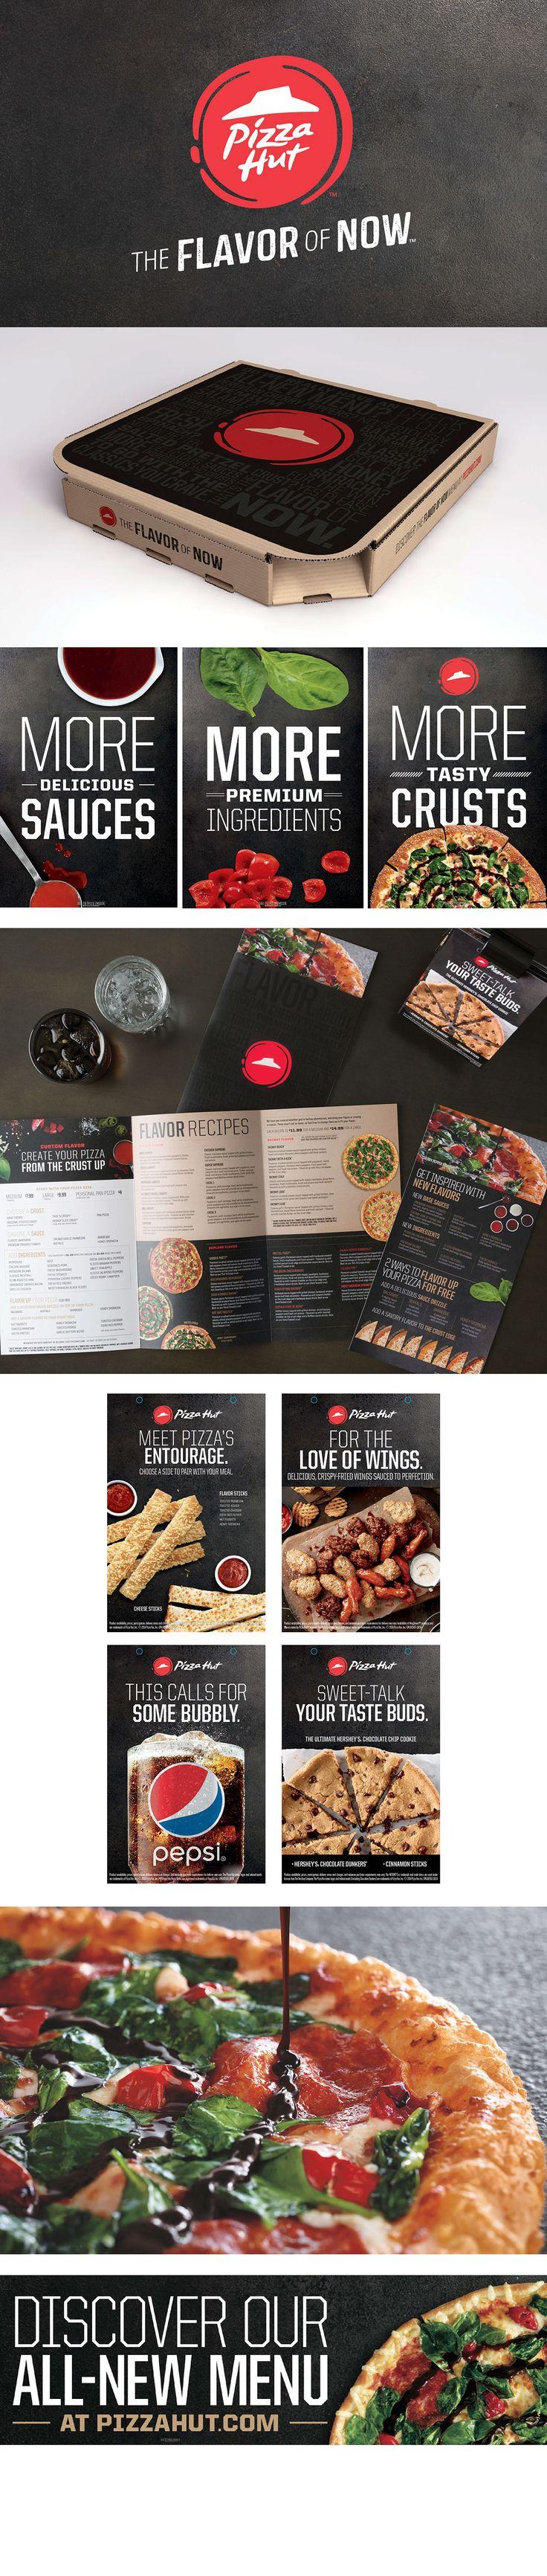 Pizza Hut Rebrand #rebrand #corporative #logo